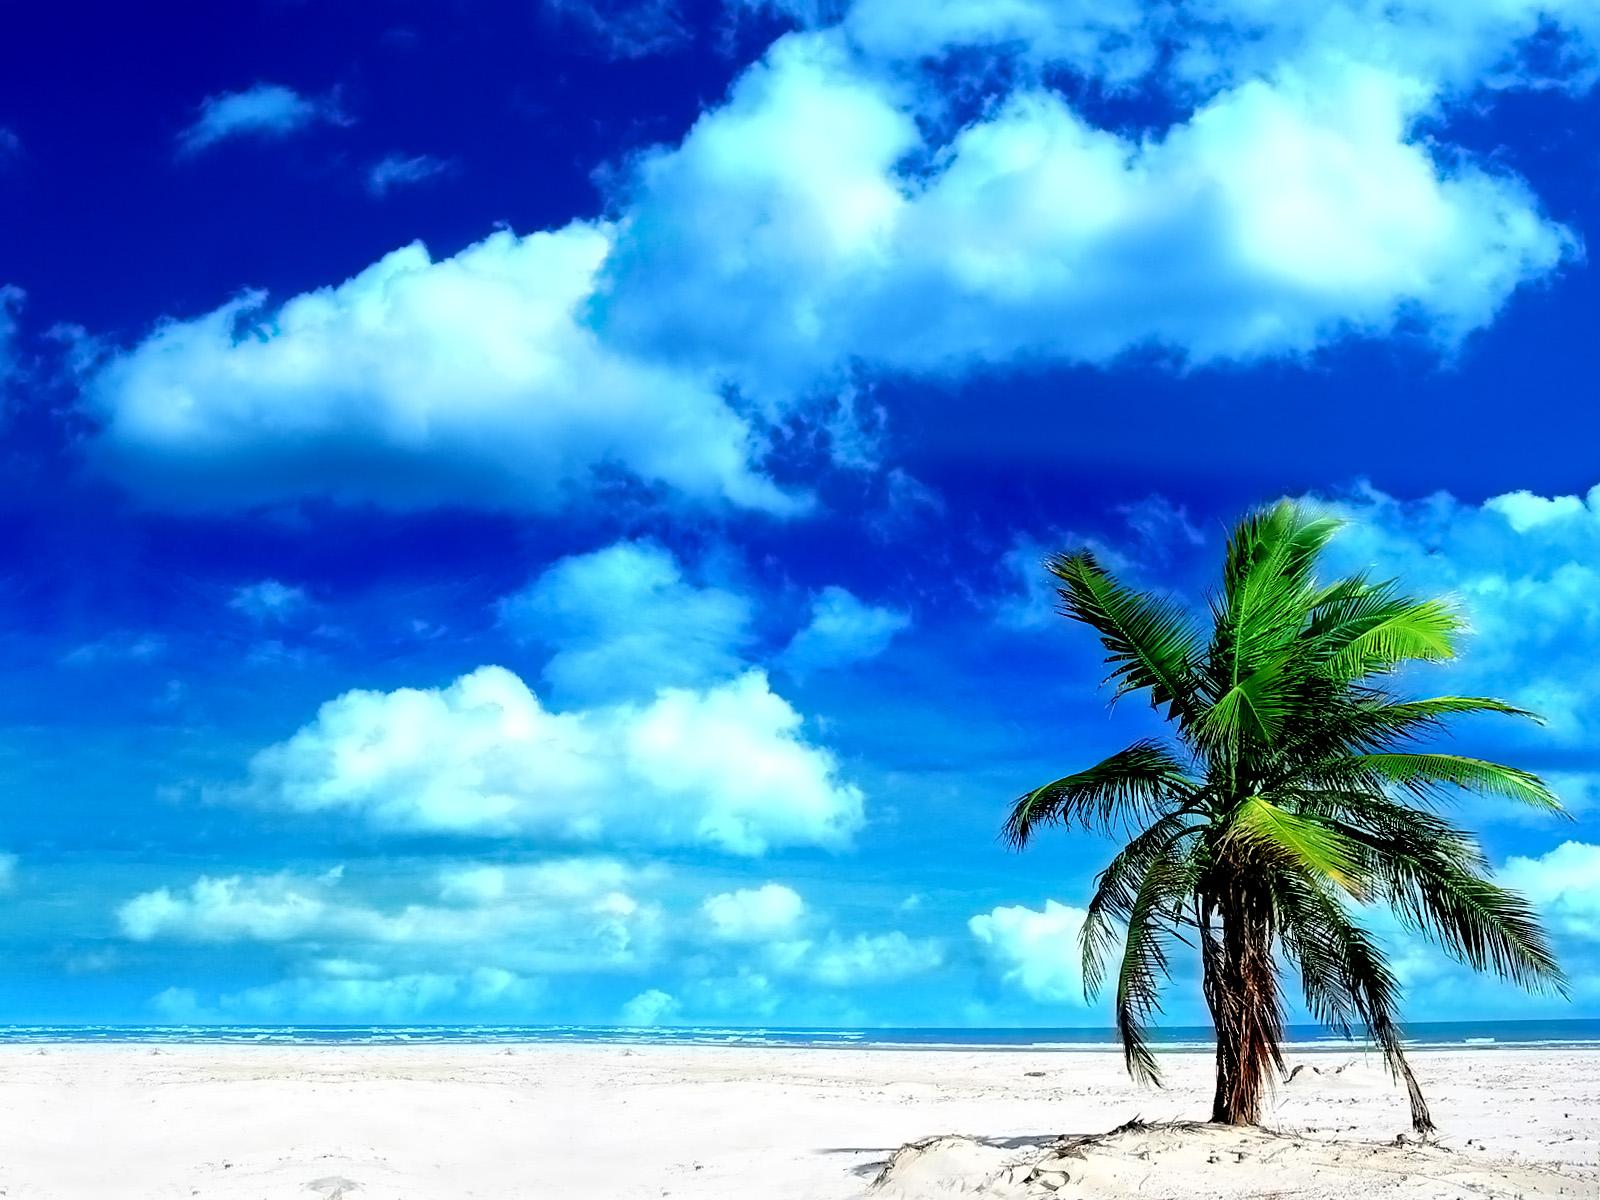 http://4.bp.blogspot.com/-RfNS_zzPFAA/T-pyOYw5G5I/AAAAAAAAD2Q/eSE5czkTGOs/s1600/holiday-beach-summer-6557.jpg